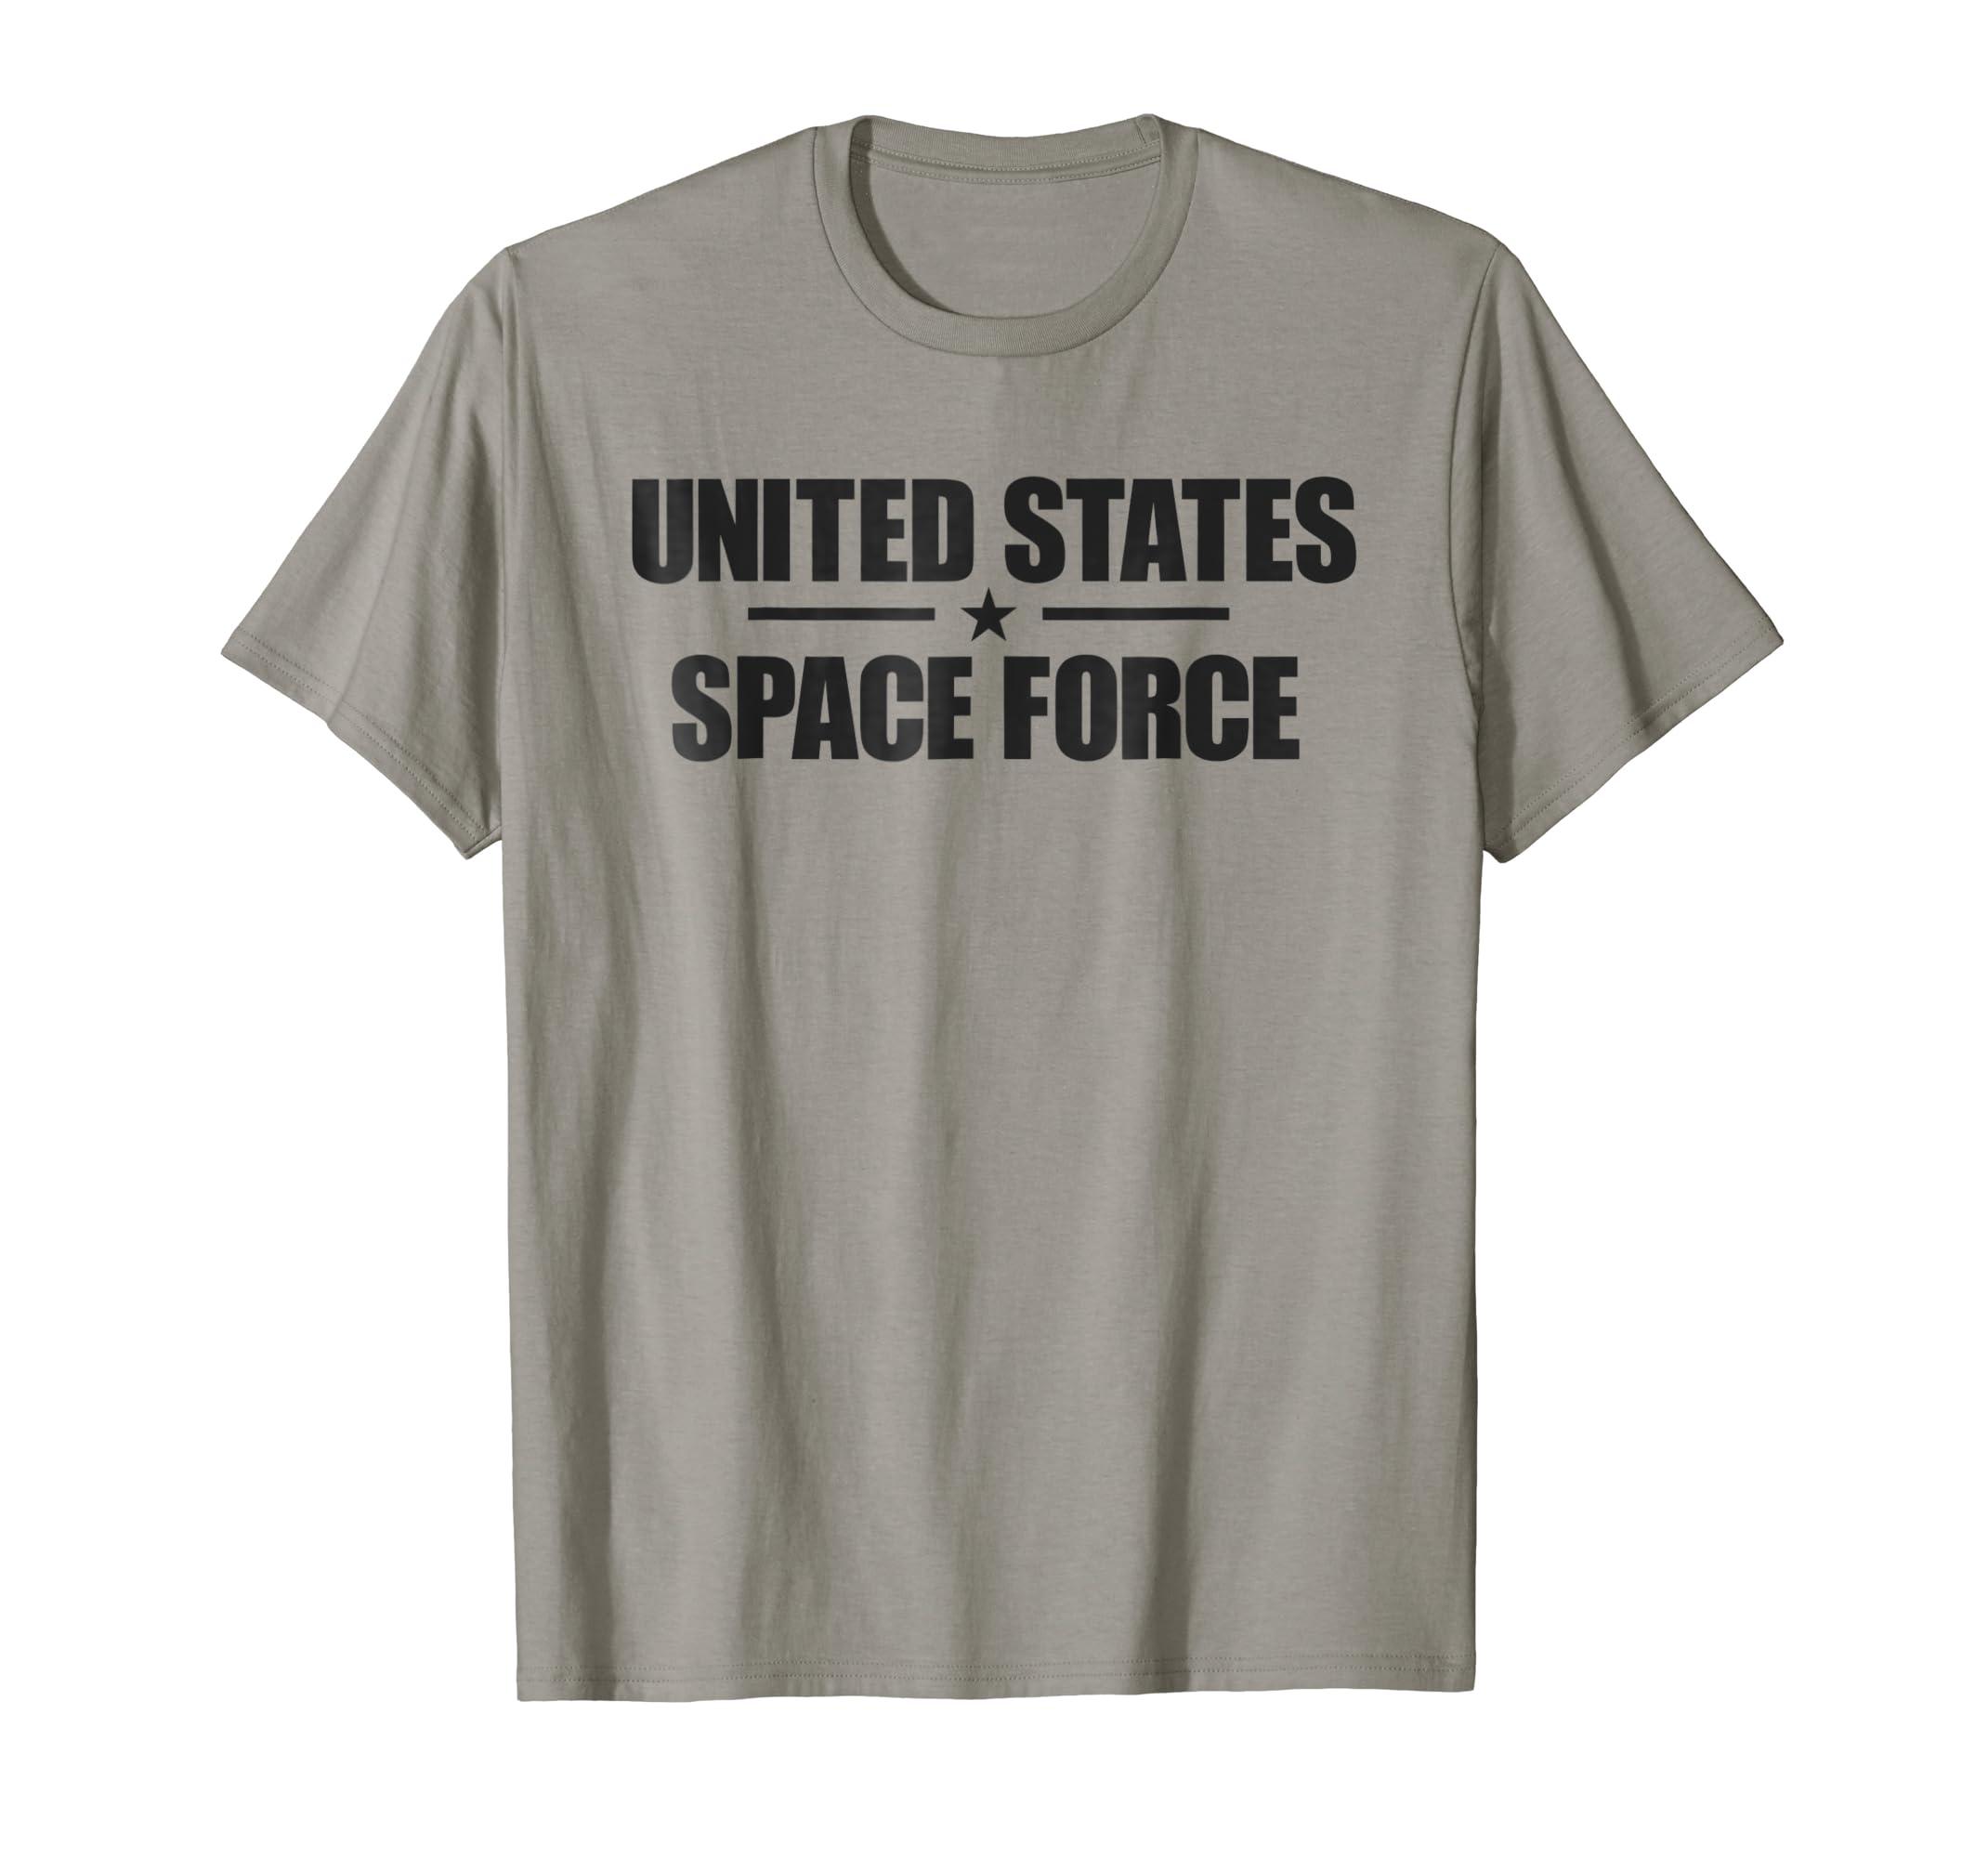 6f60502643 Amazon.com: U.S. Space Force T-shirt: Clothing